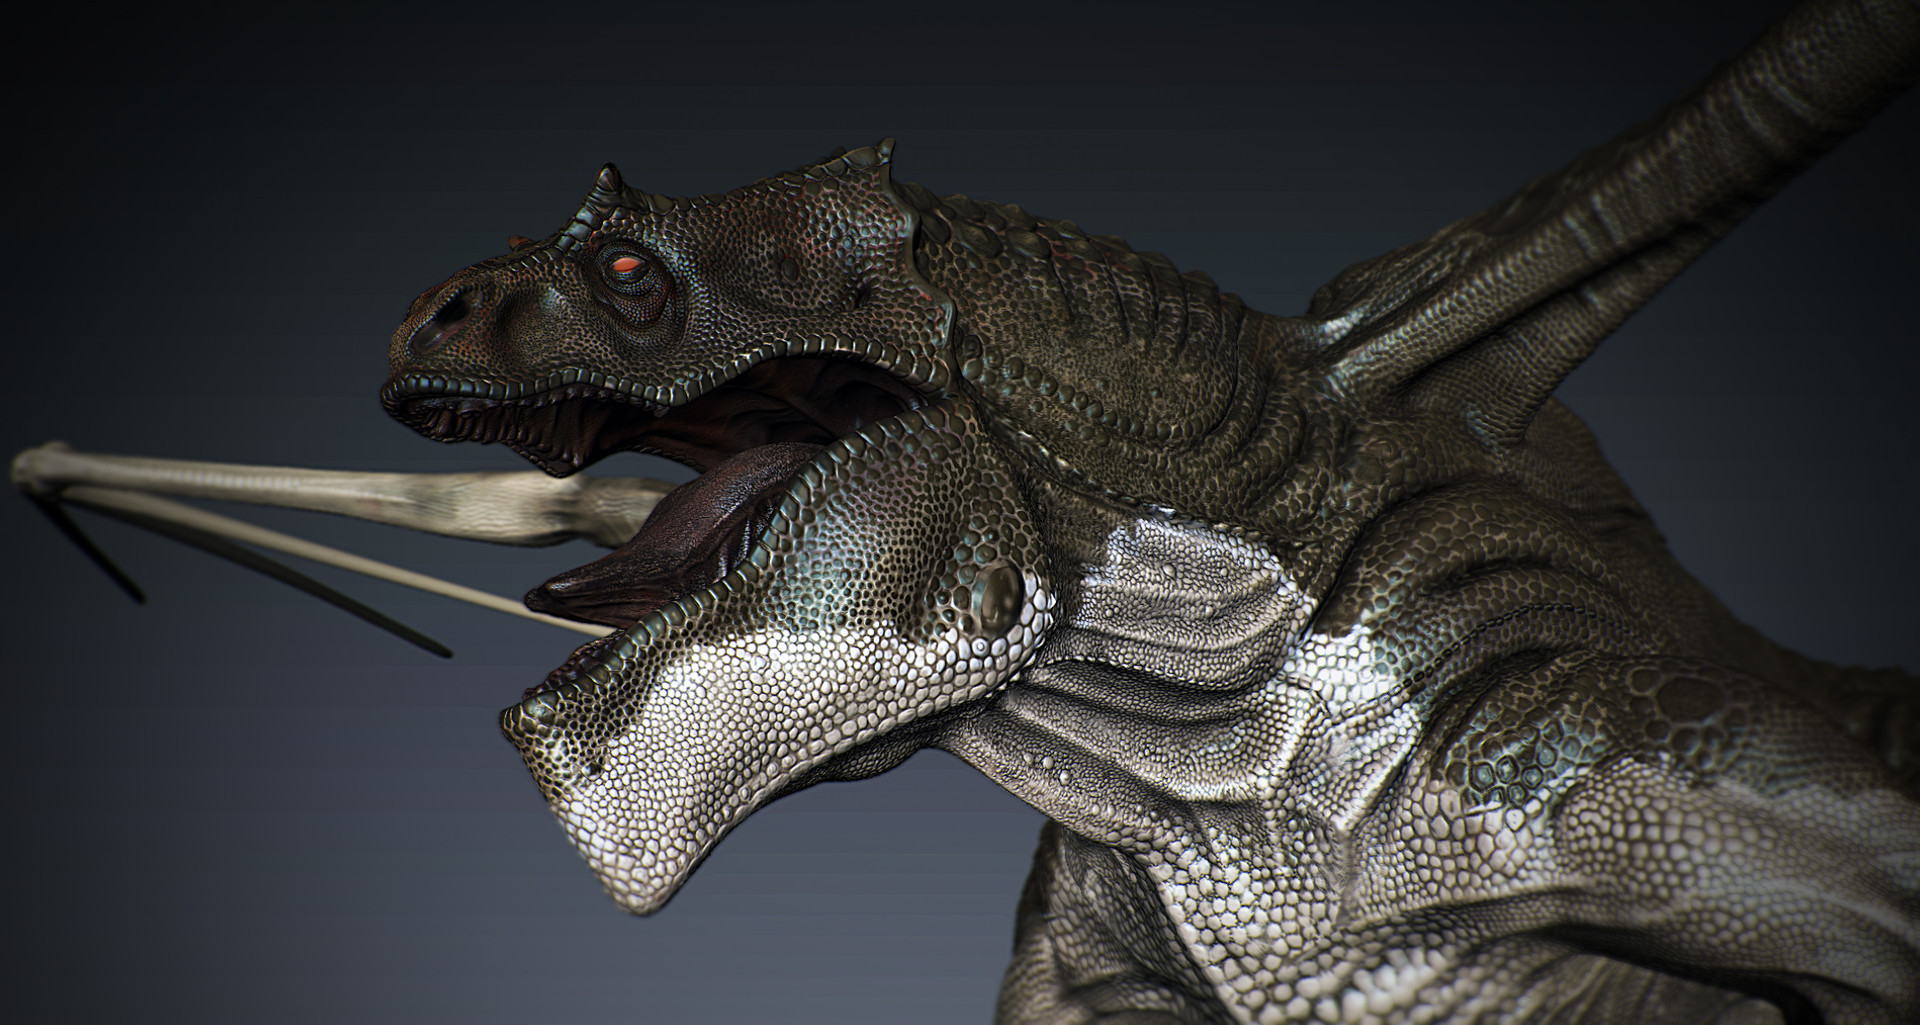 Cian o reilly dragoncoloured